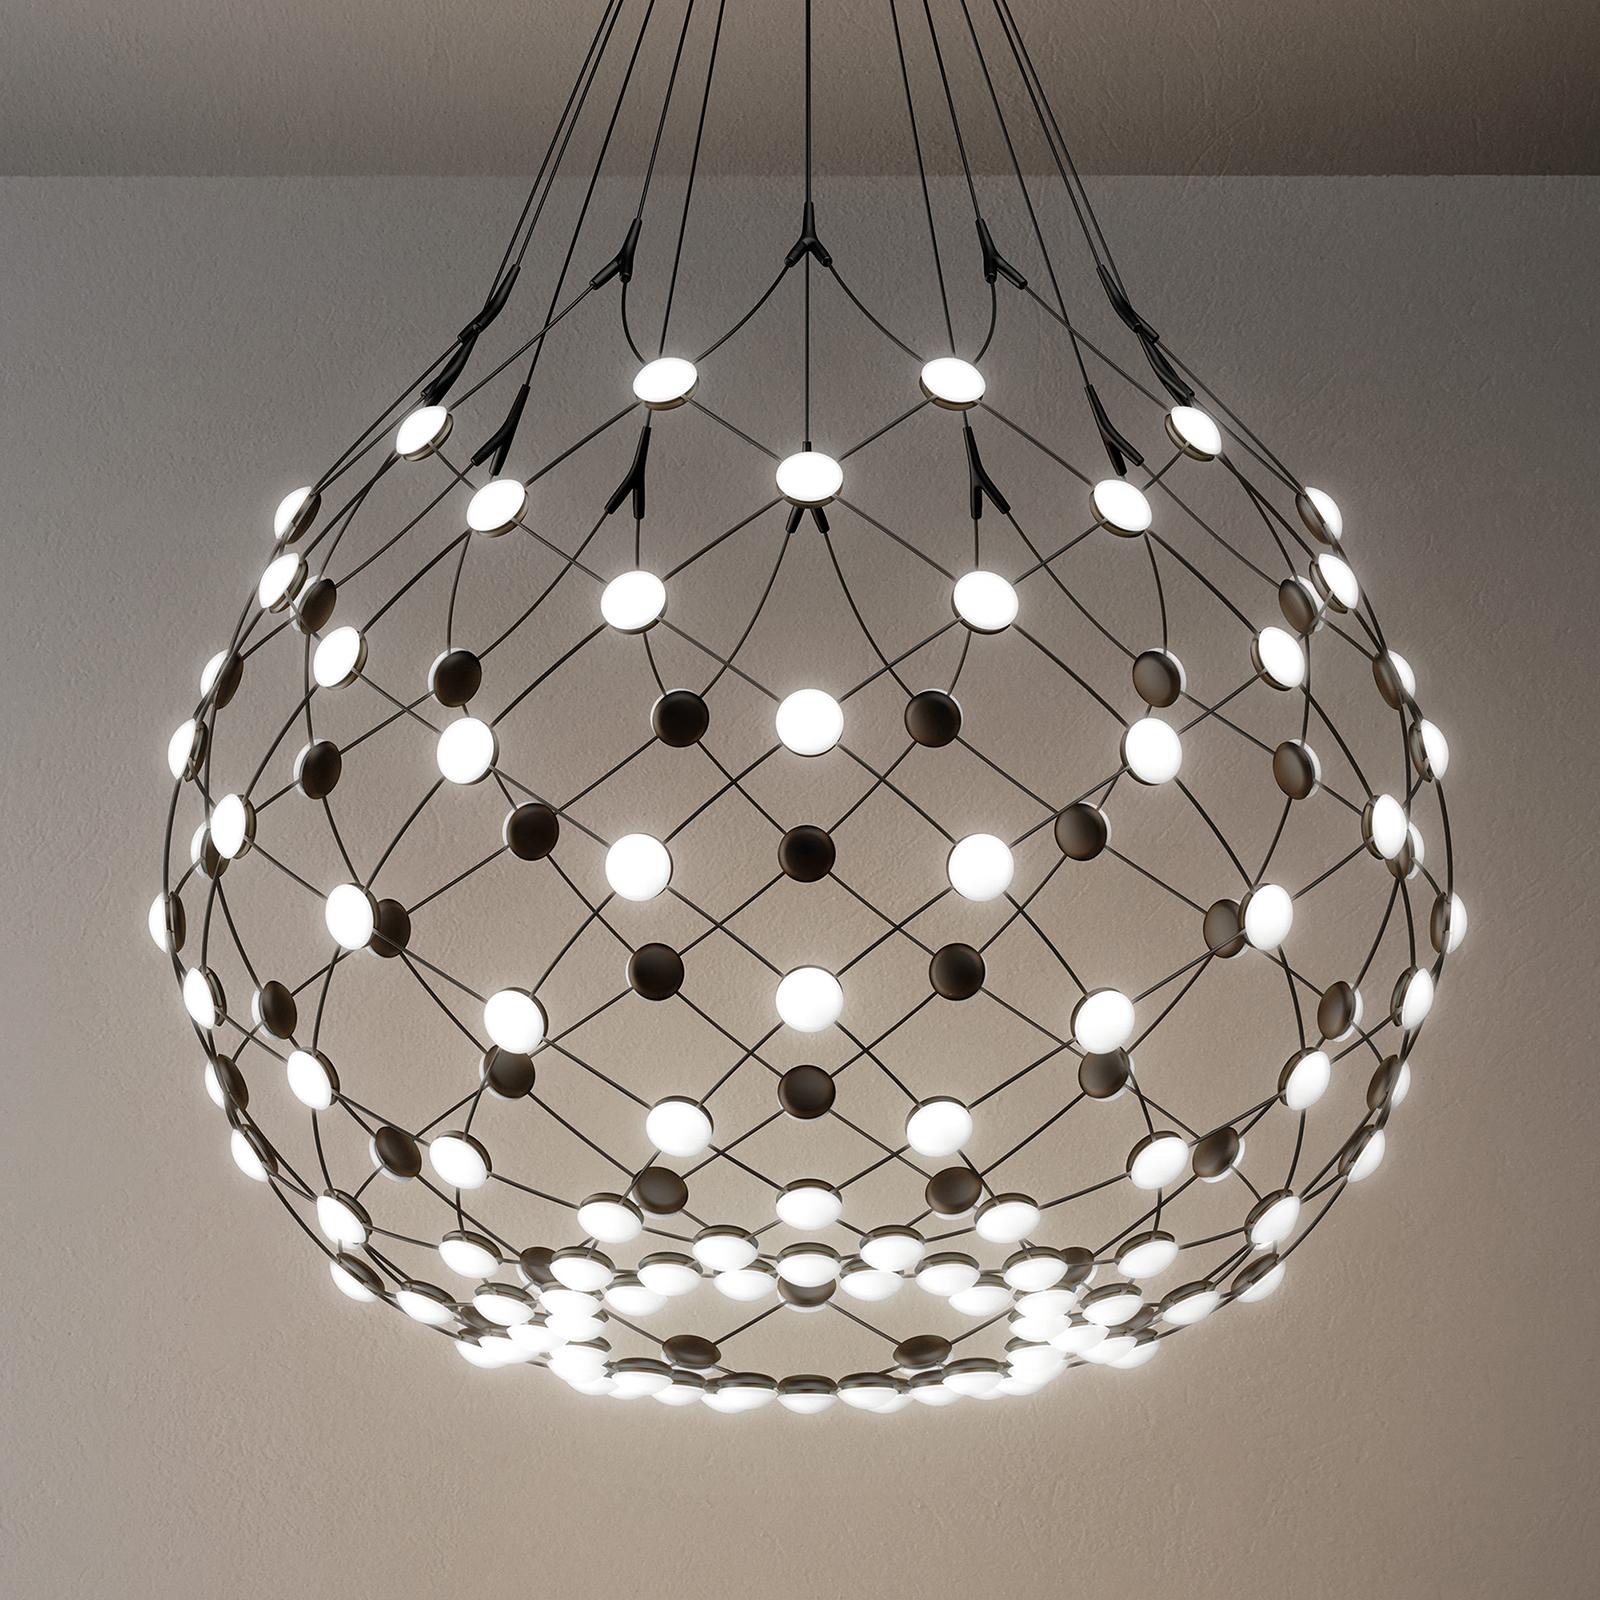 Luceplan Mesh lampa wisząca Ø 80cm Wireless 3m